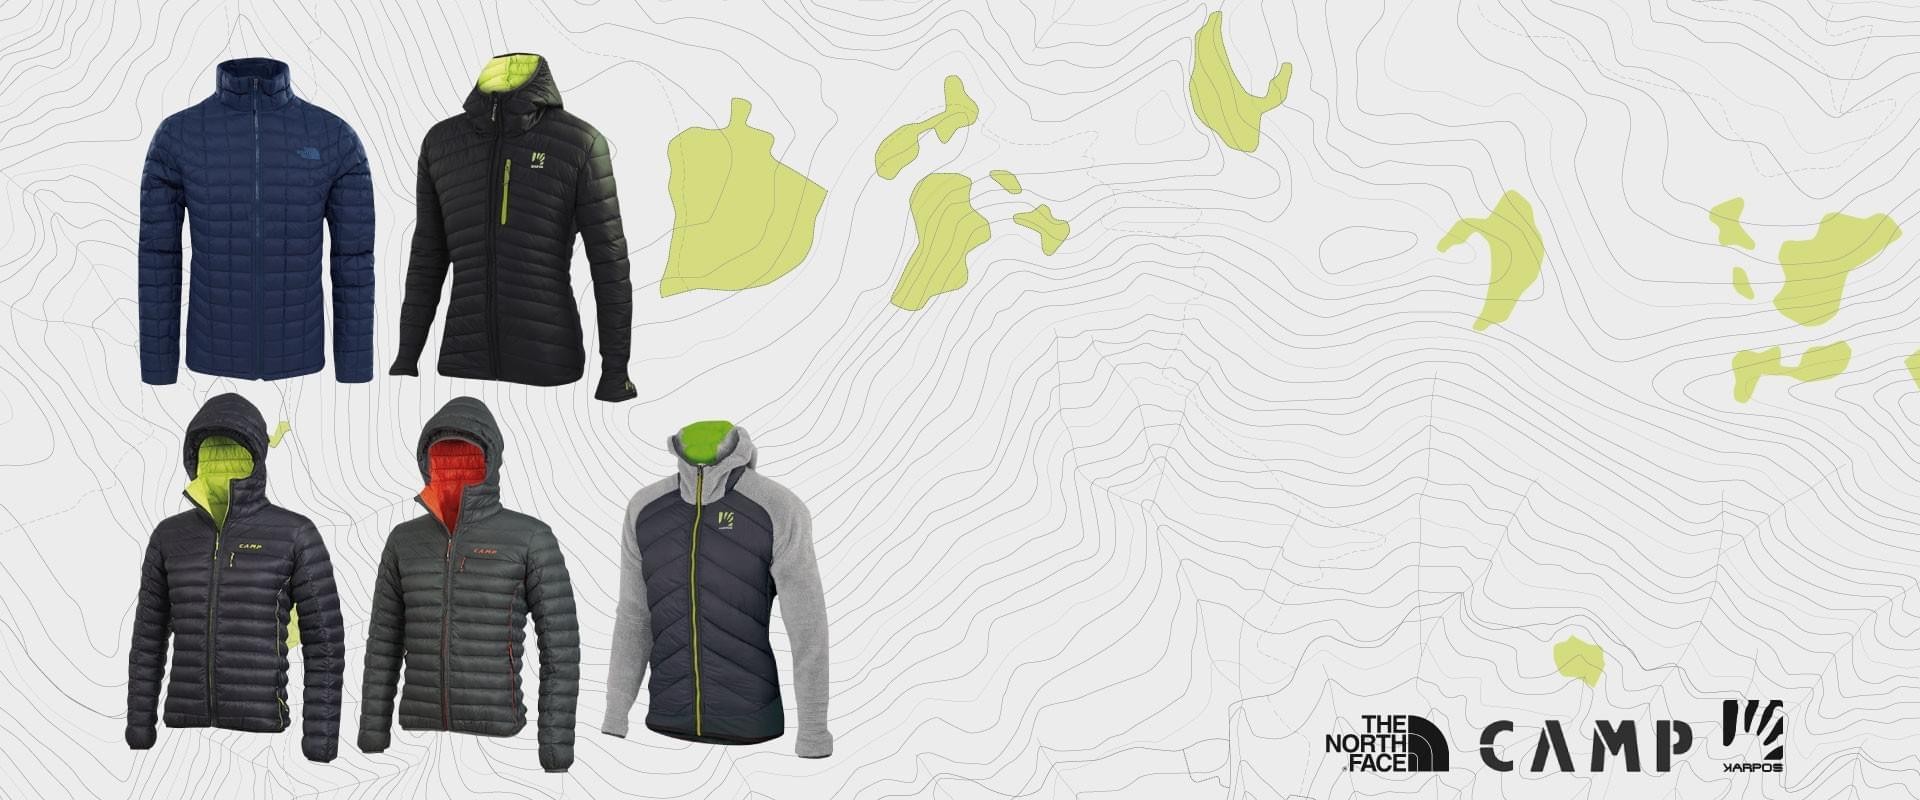 Saldi giacche trekking uomo